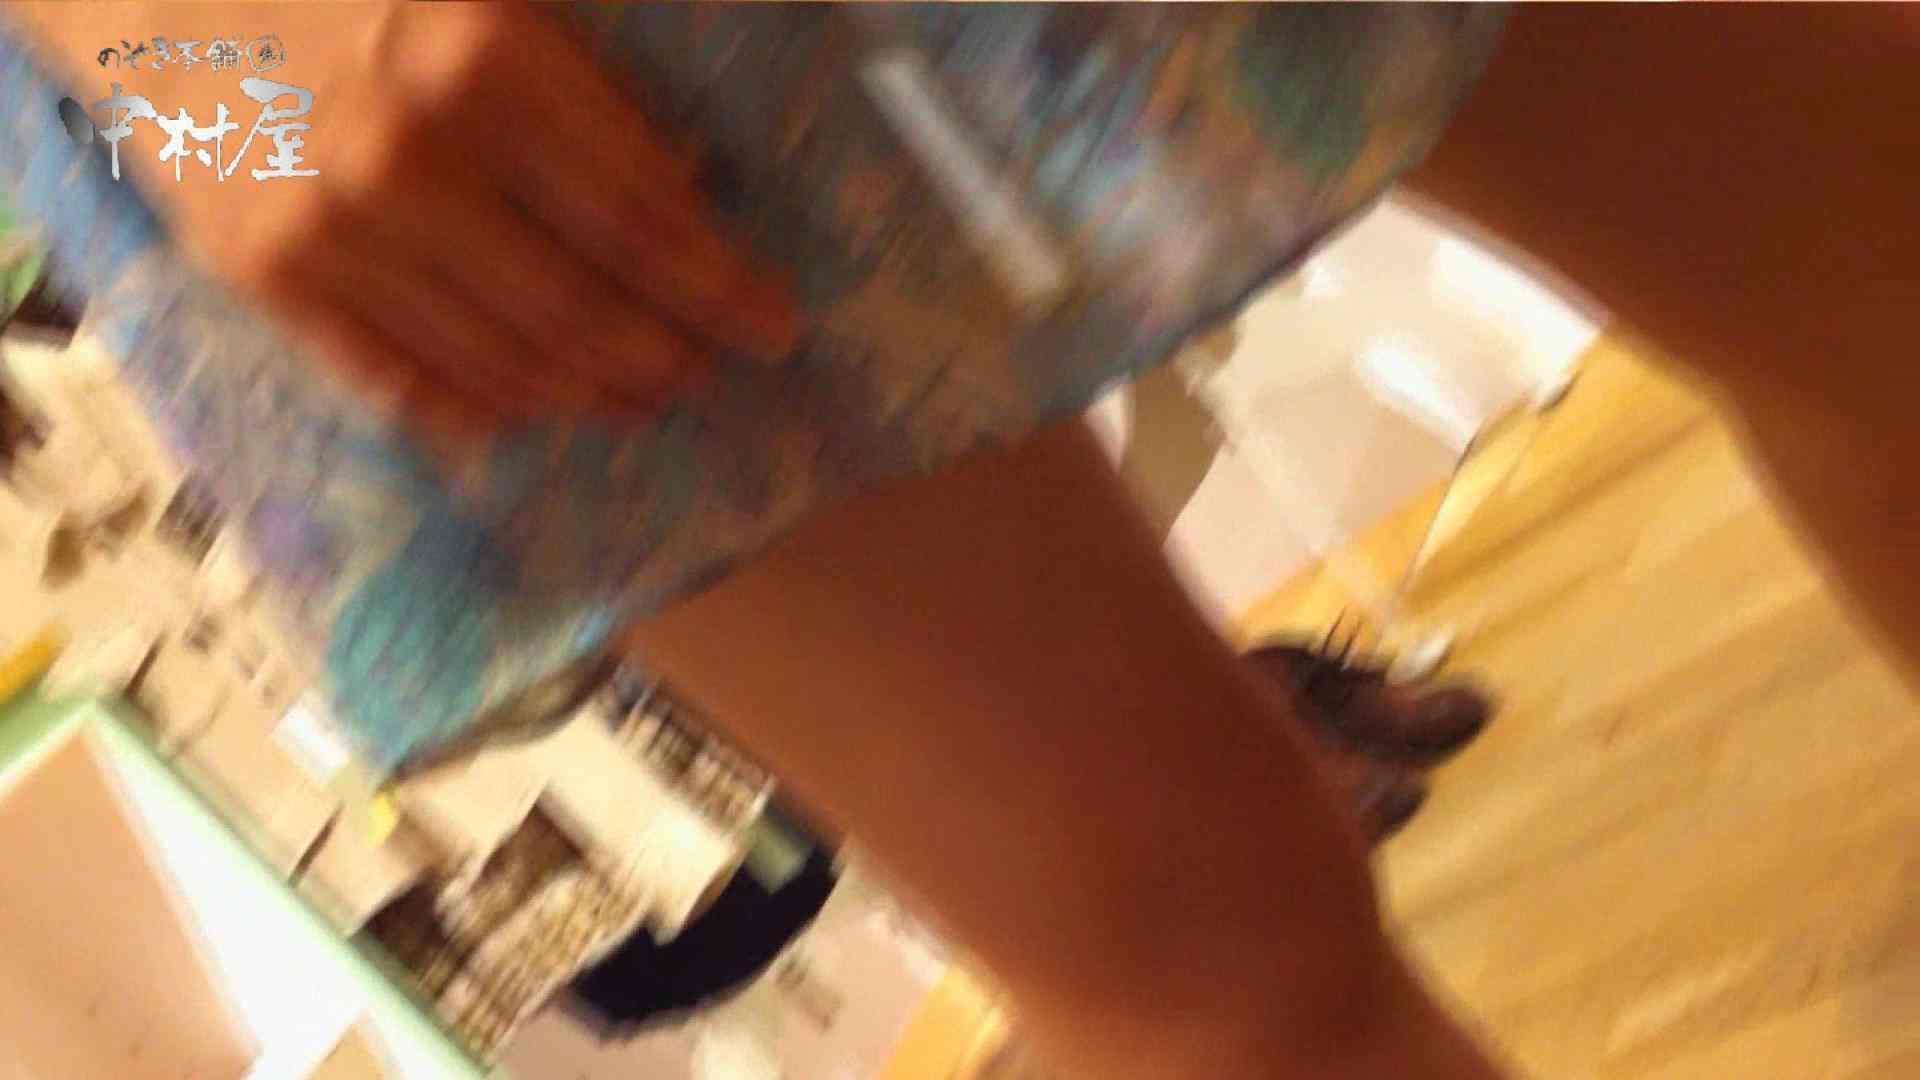 vol.43 可愛いカリスマ店員限定‼胸チラ&パンチラ 美脚おねーさんの胸元ゲット! エロティックなOL AV無料動画キャプチャ 86画像 68